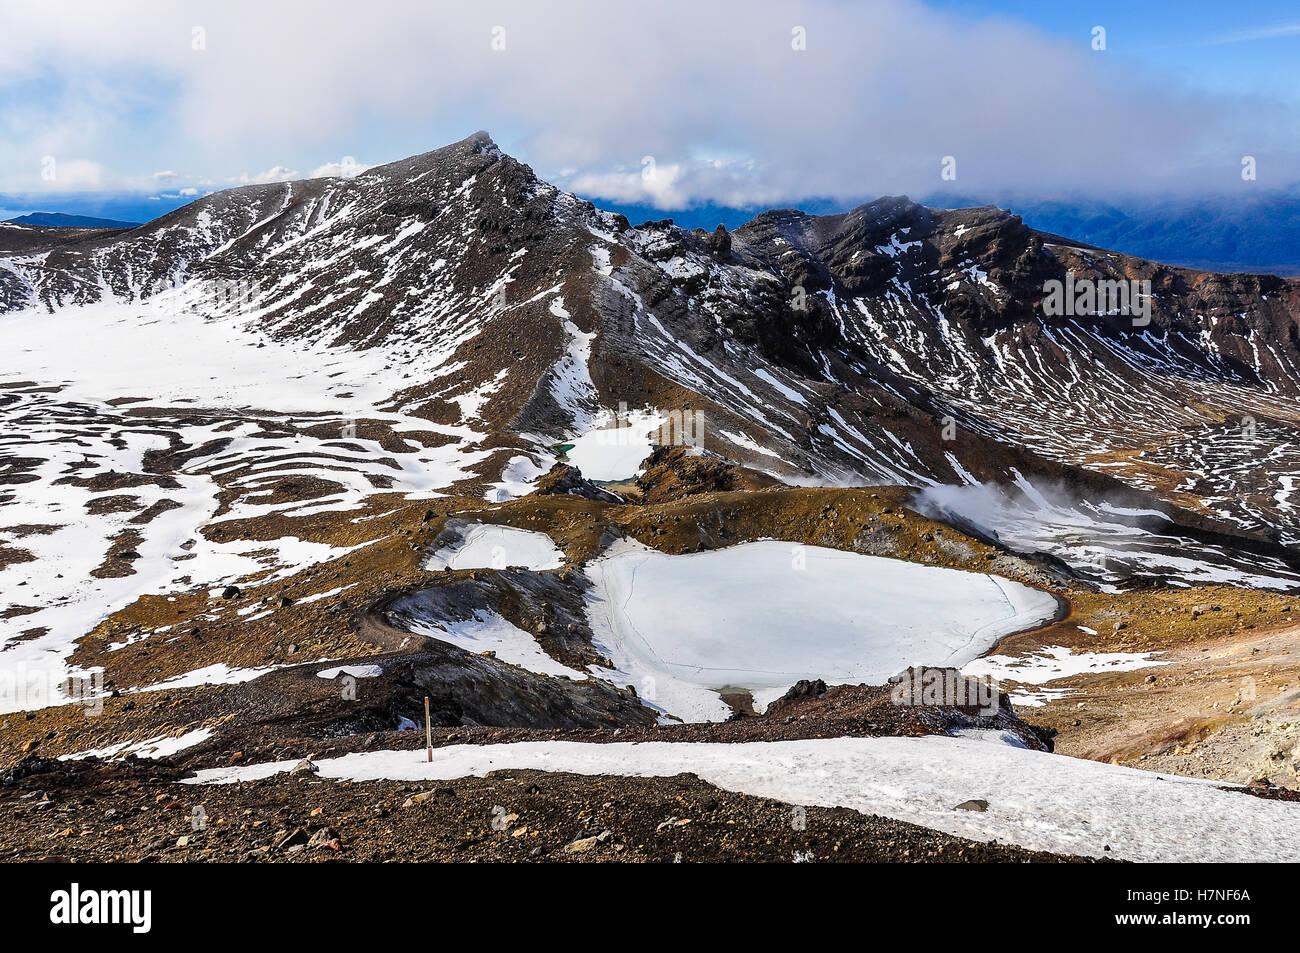 Frozen Emerald Lakes in the winter Tongariro Alpine Crossing, New Zealand - Stock Image